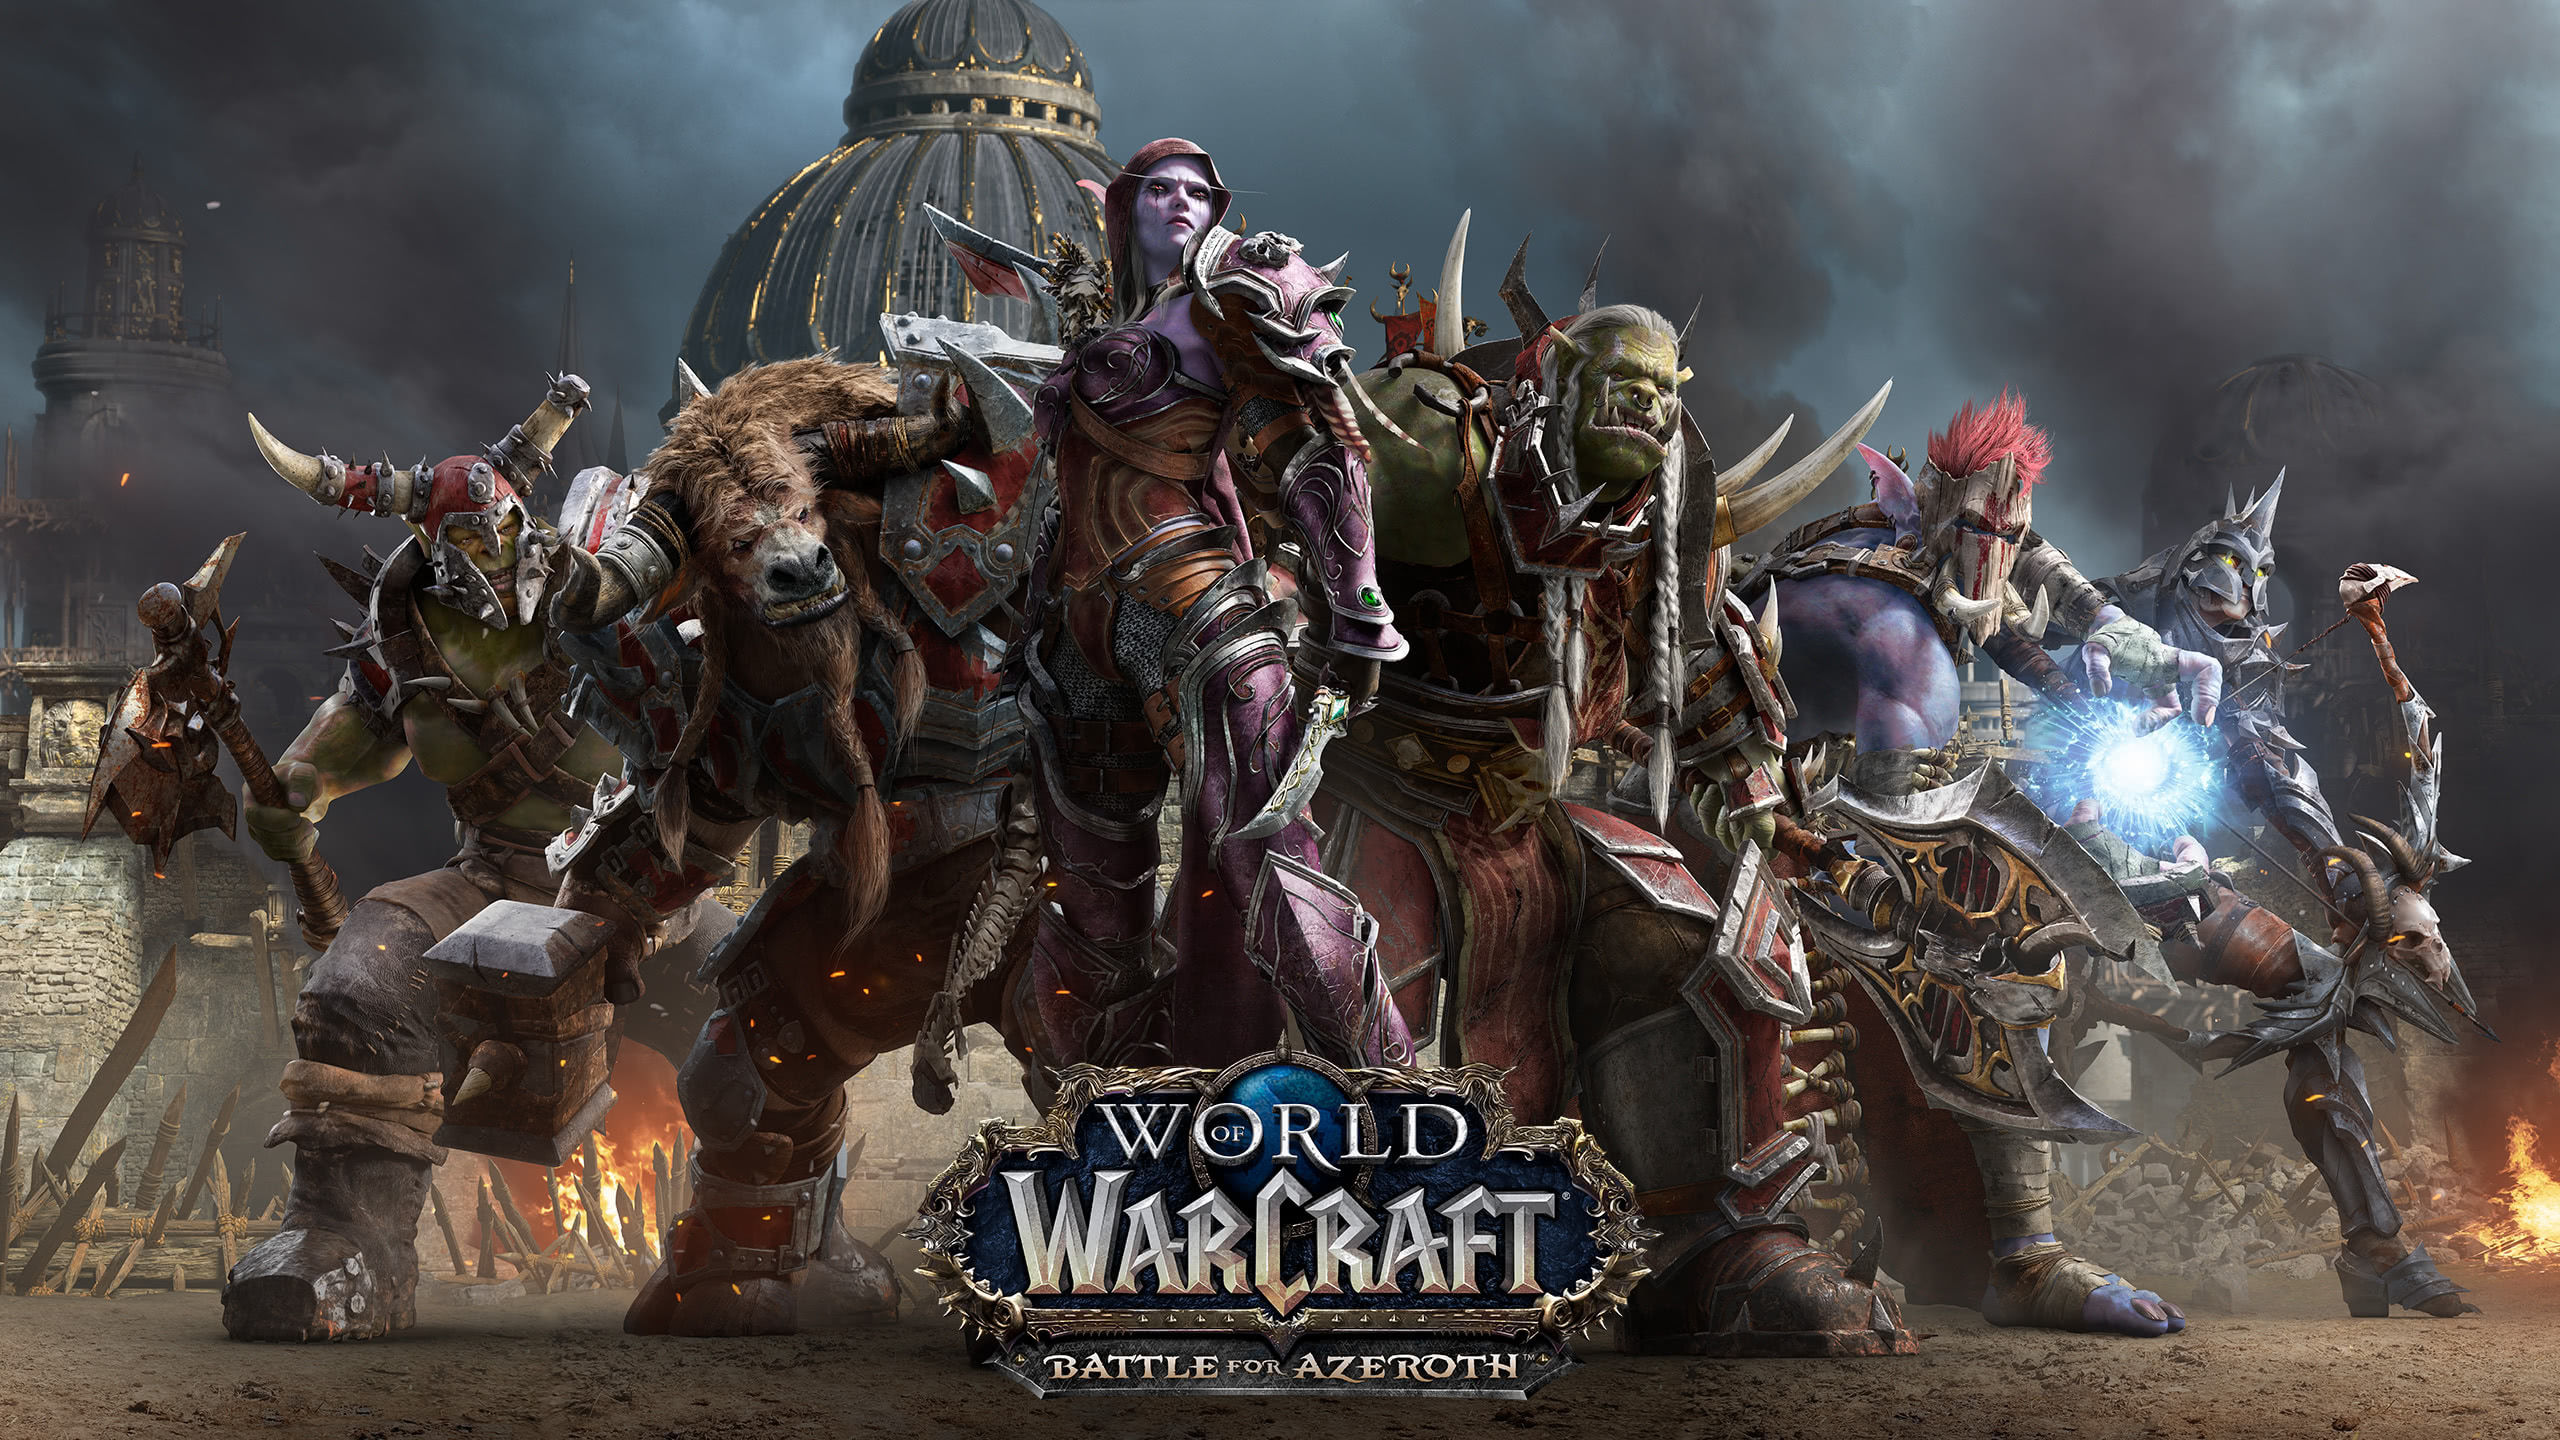 World Of Warcraft Battle For Azeroth Horrde WQHD 1440P Wallpaper 2560x1440